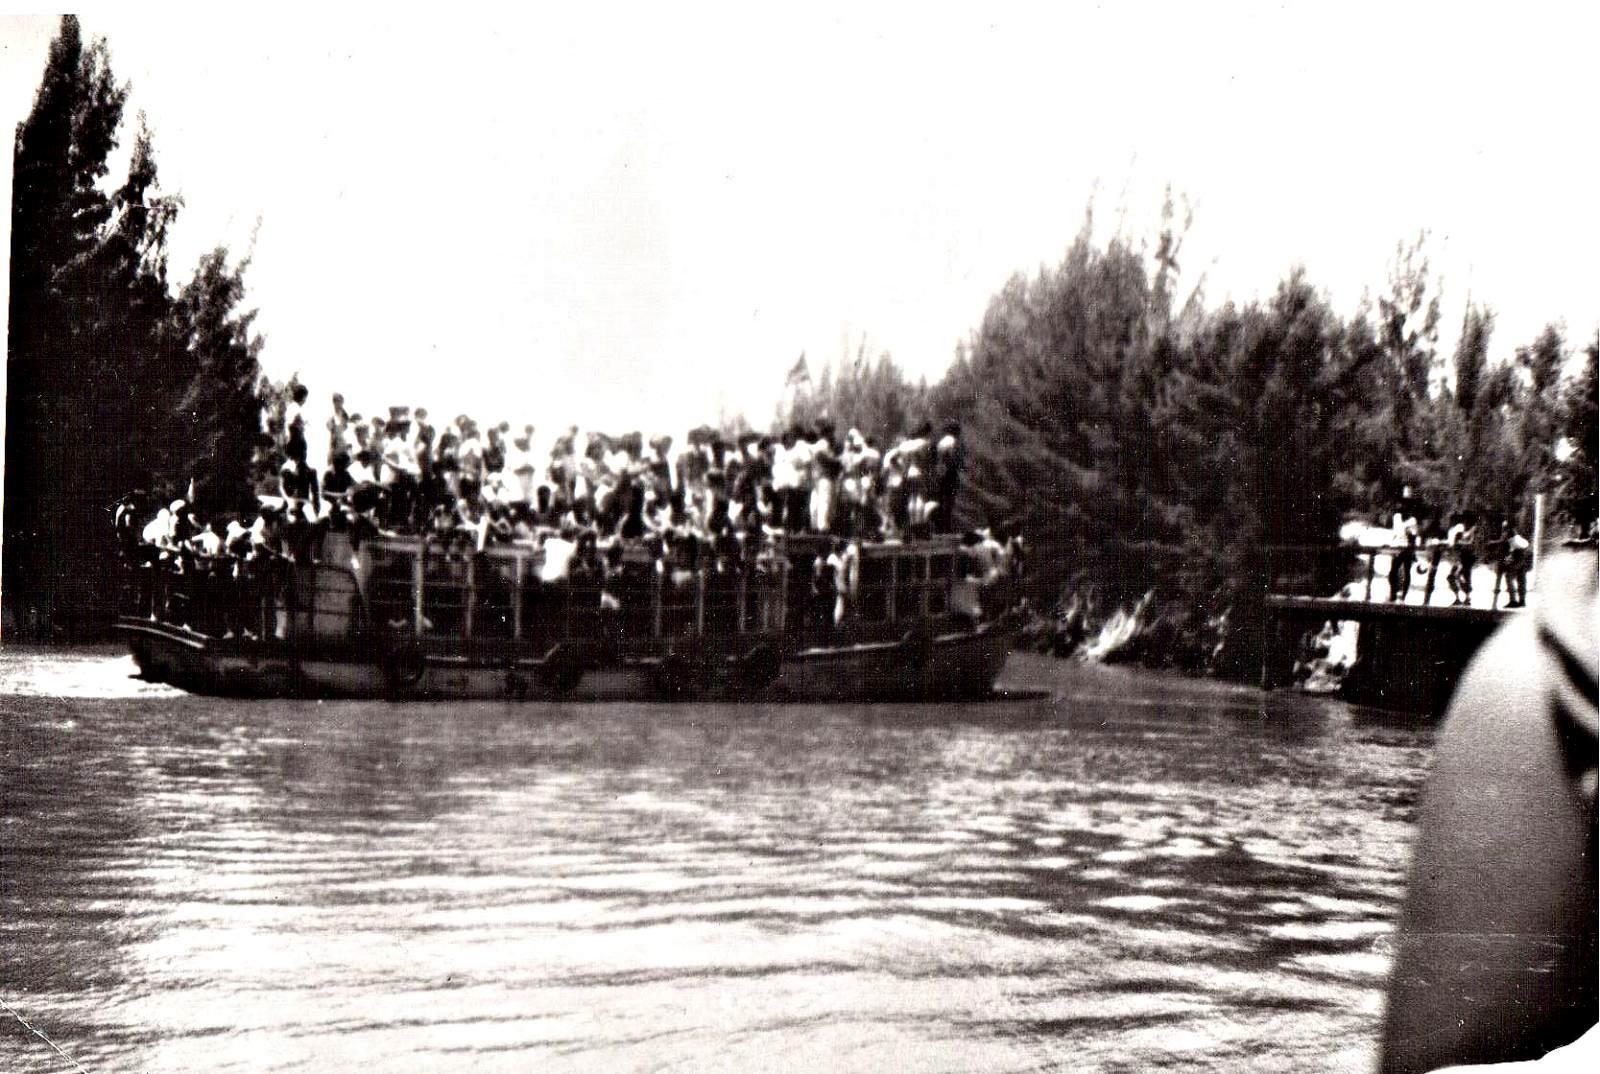 1987-1988. Остров Кайо Моа. Причал. 3 фото